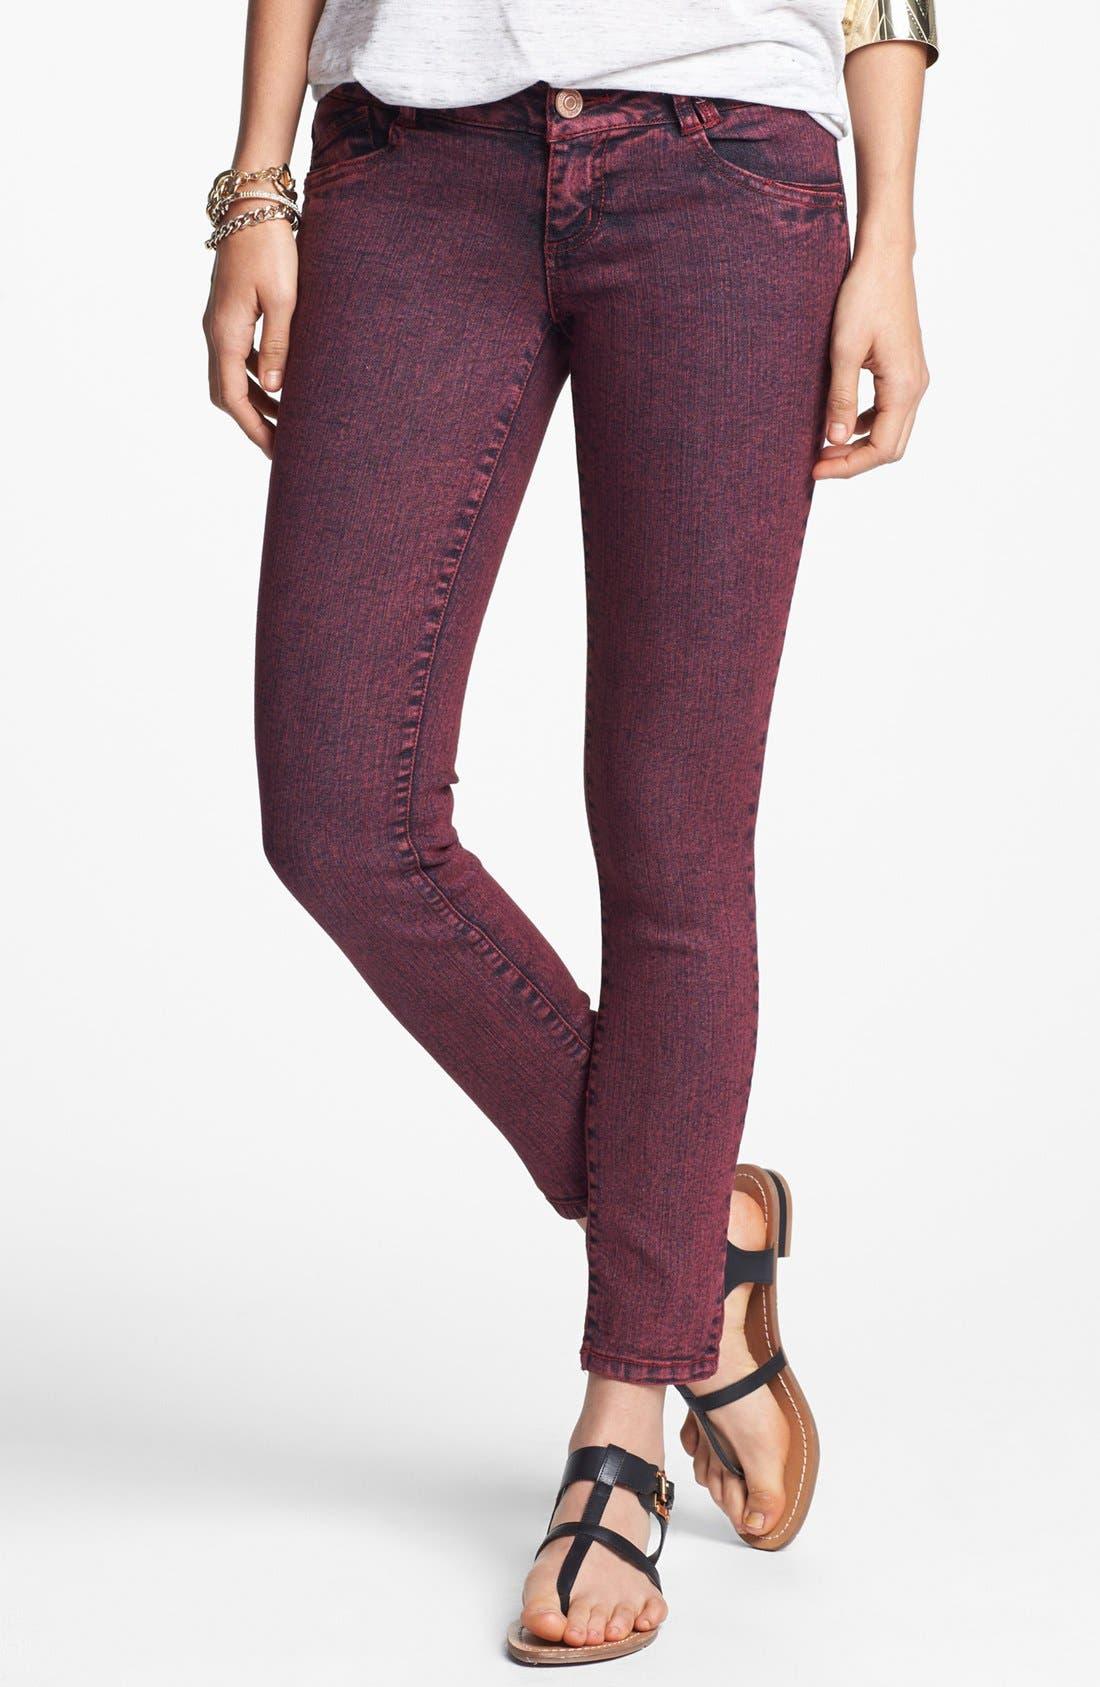 Alternate Image 1 Selected - Jolt Overdyed Skinny Jeans (Brick) (Juniors)